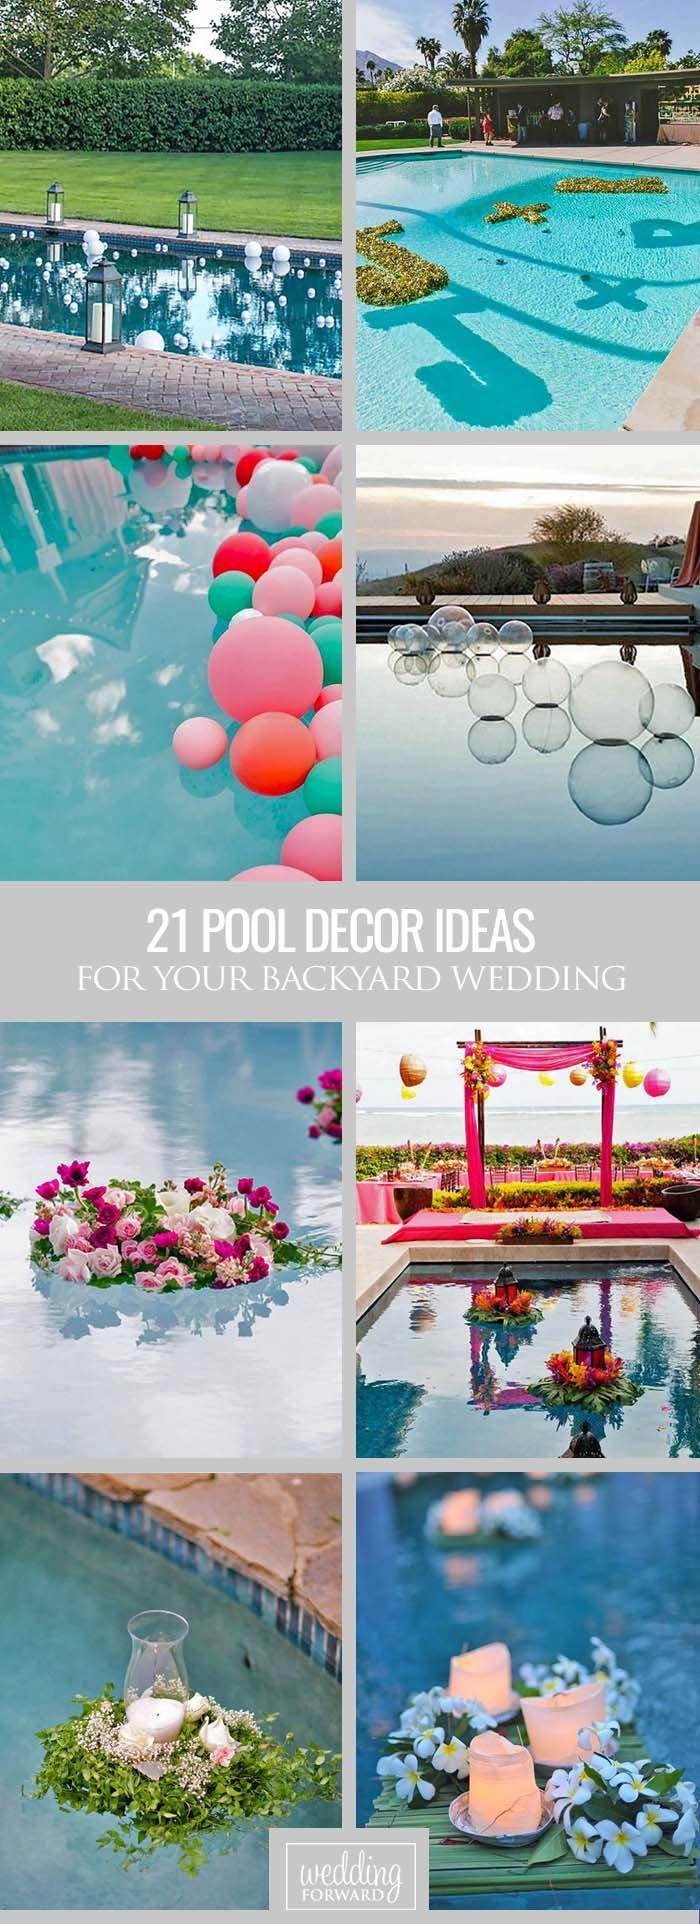 21 pool decor ideas for your backyard wedding pool decor for Pool party dekoration